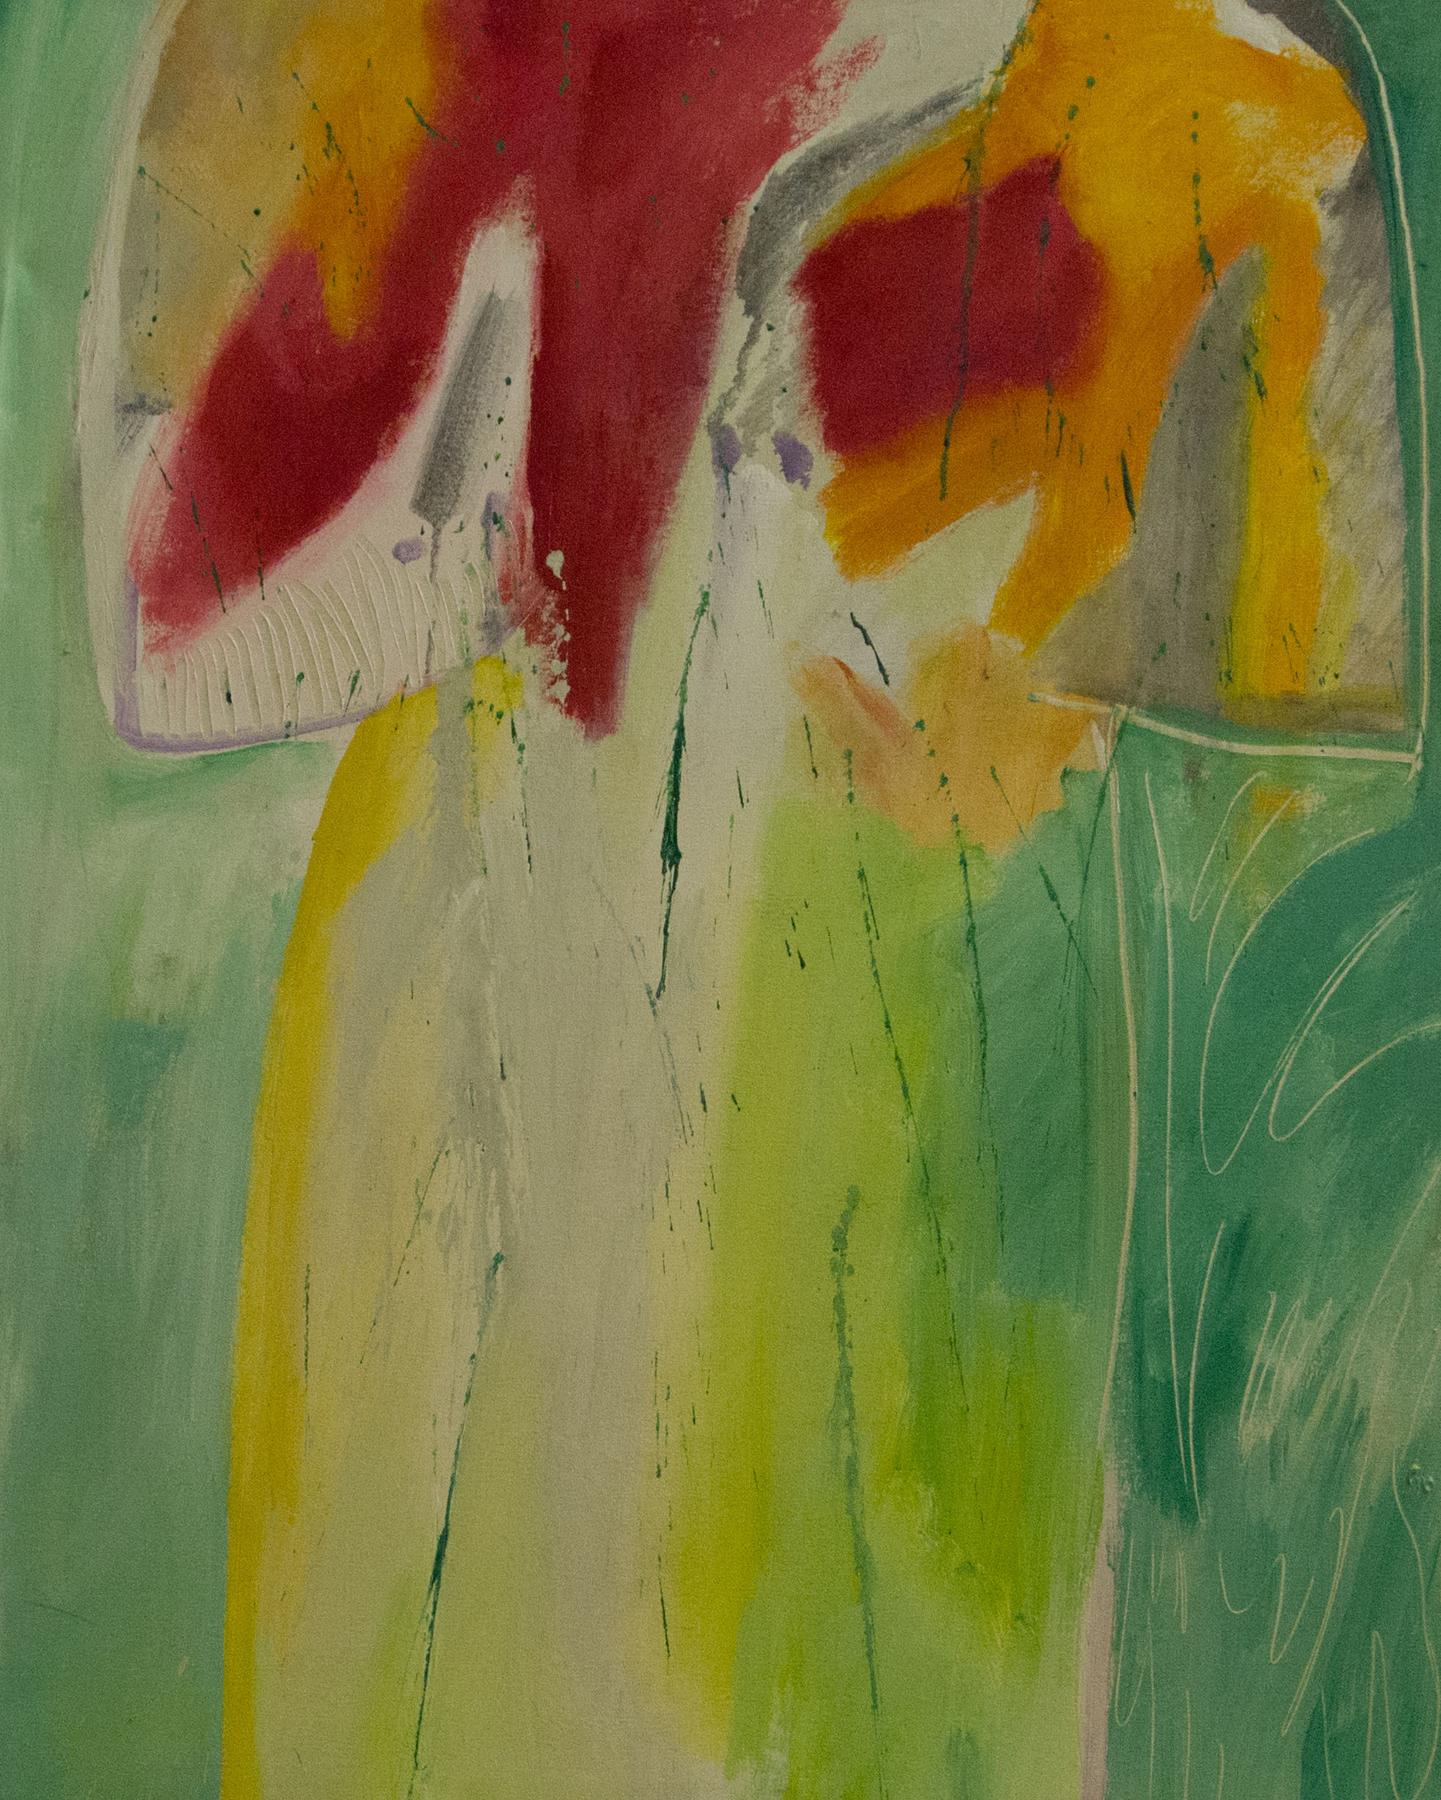 Springtime Kimono, 2003. Acrylic on canvas, 43 x 30 in. (109 x 76 cm.)